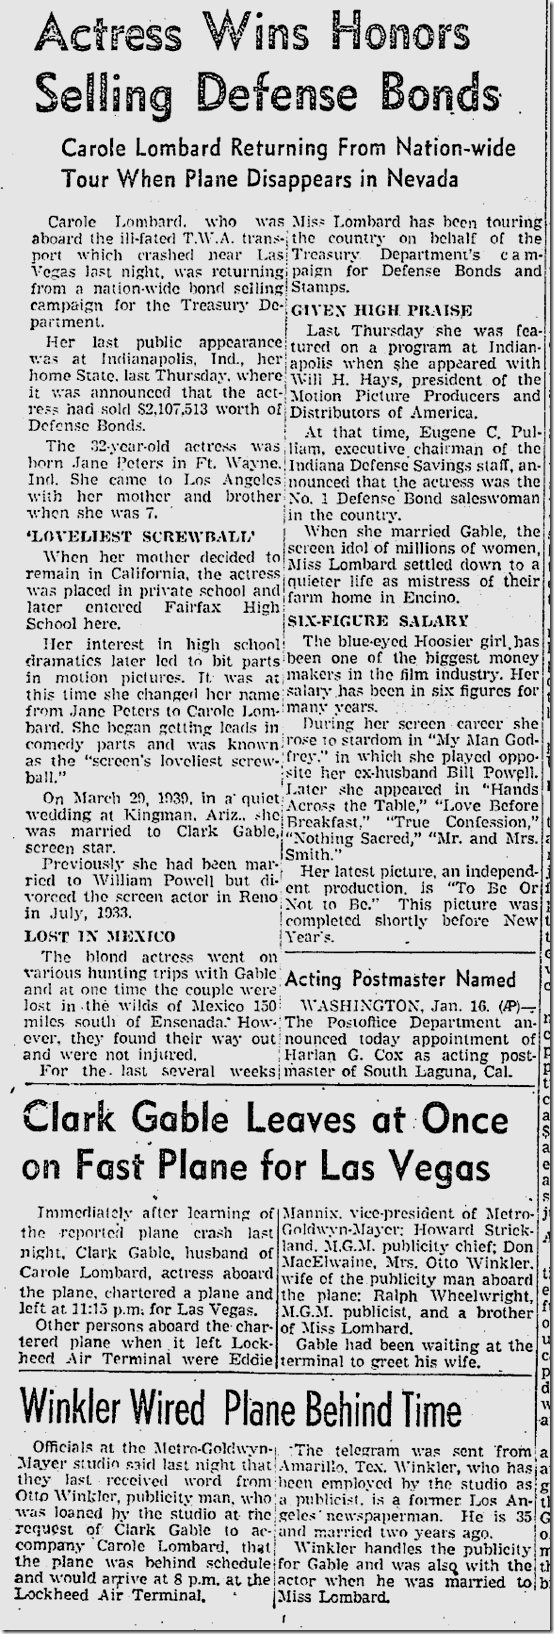 Jan. 17, 1942, Carole Lombard